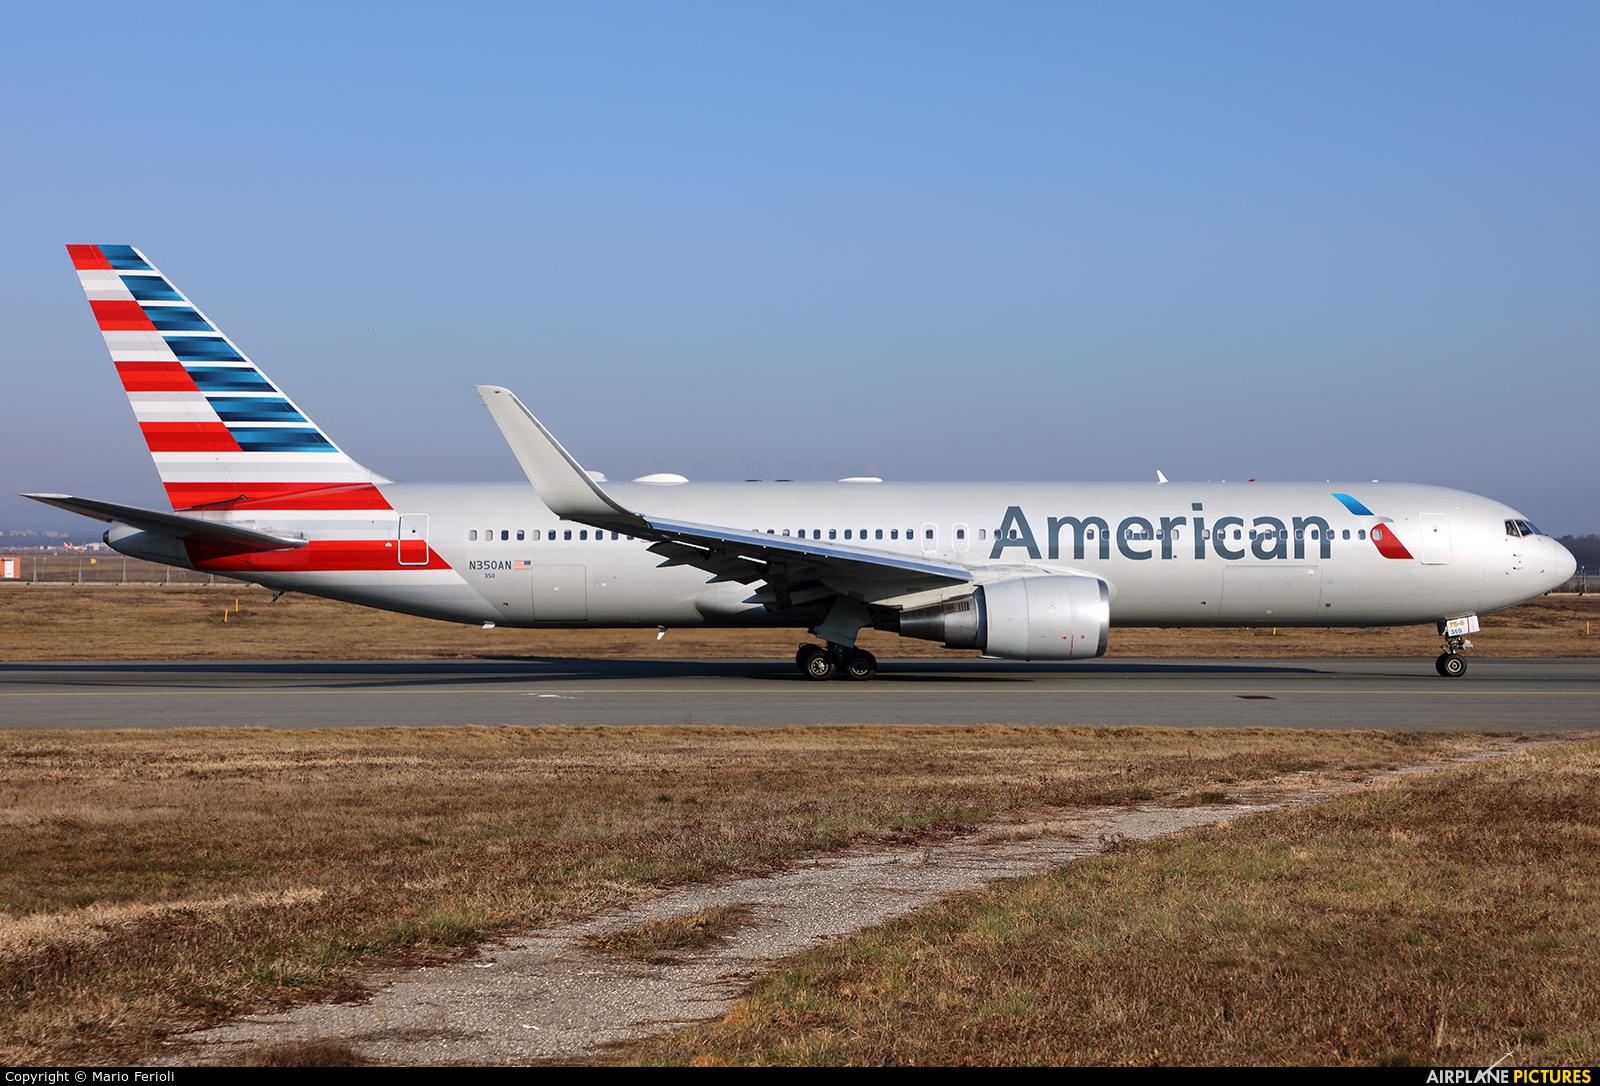 American Airlines N350AN aircraft at Milan - Malpensa